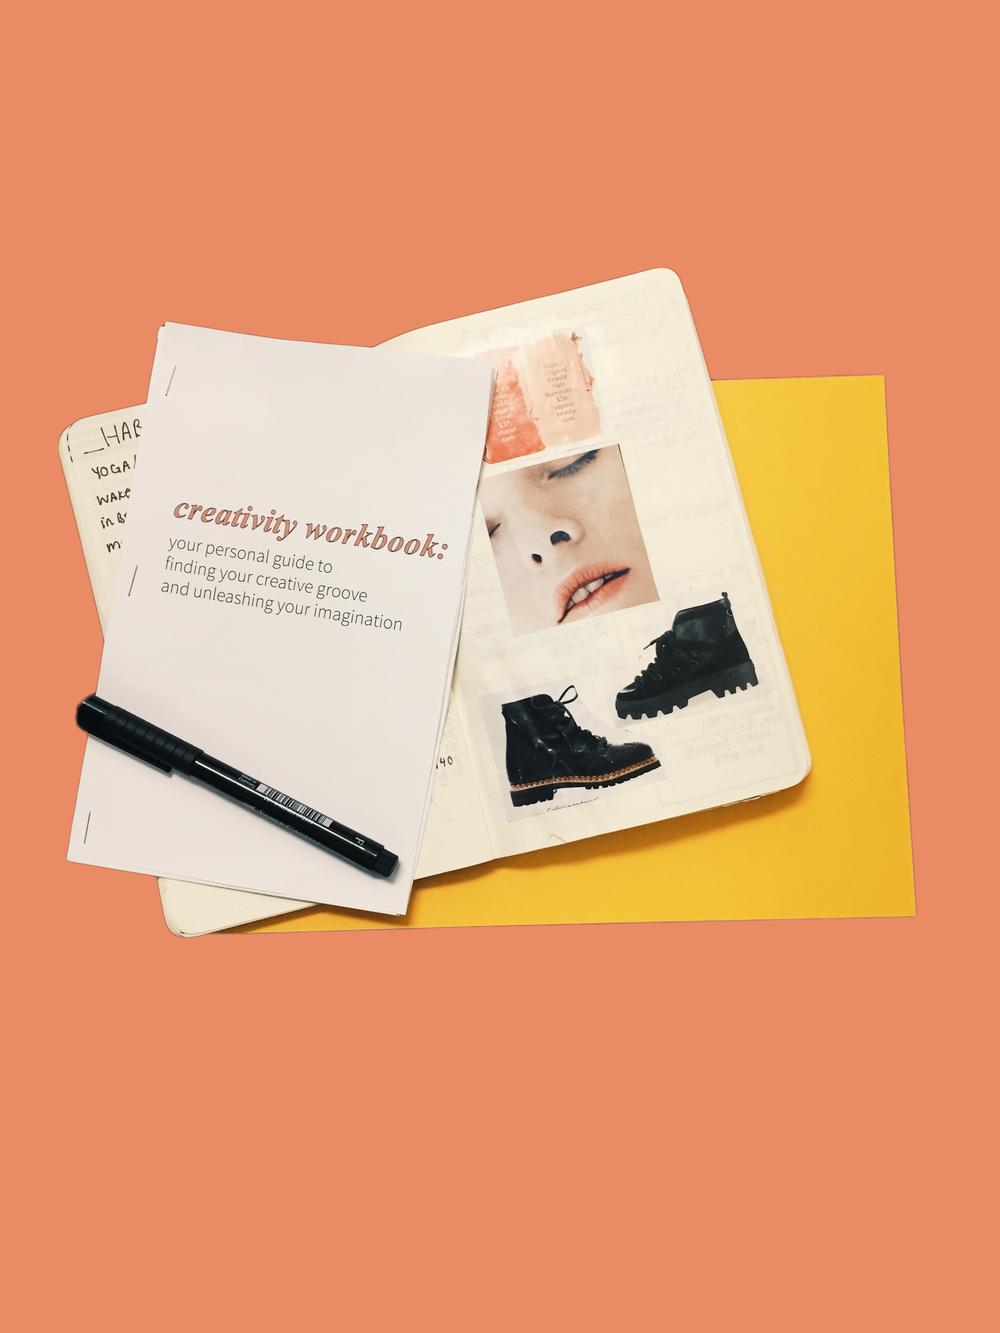 Creativity Workbook_Flat Lay.png